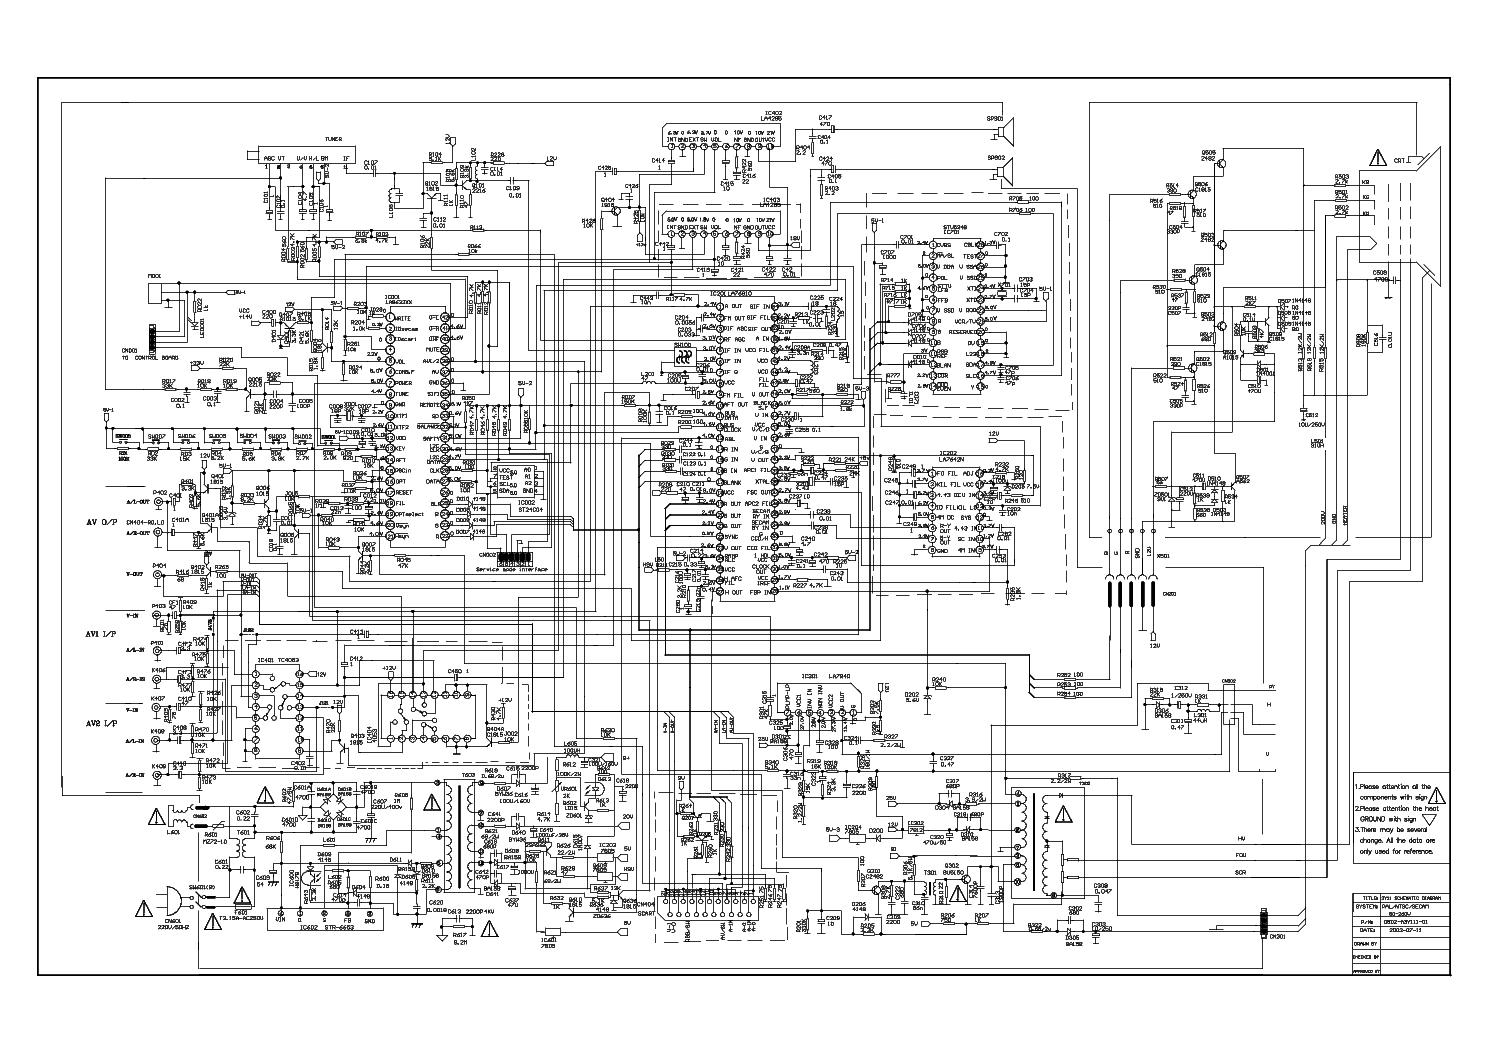 erisson телевизор 1407 схема